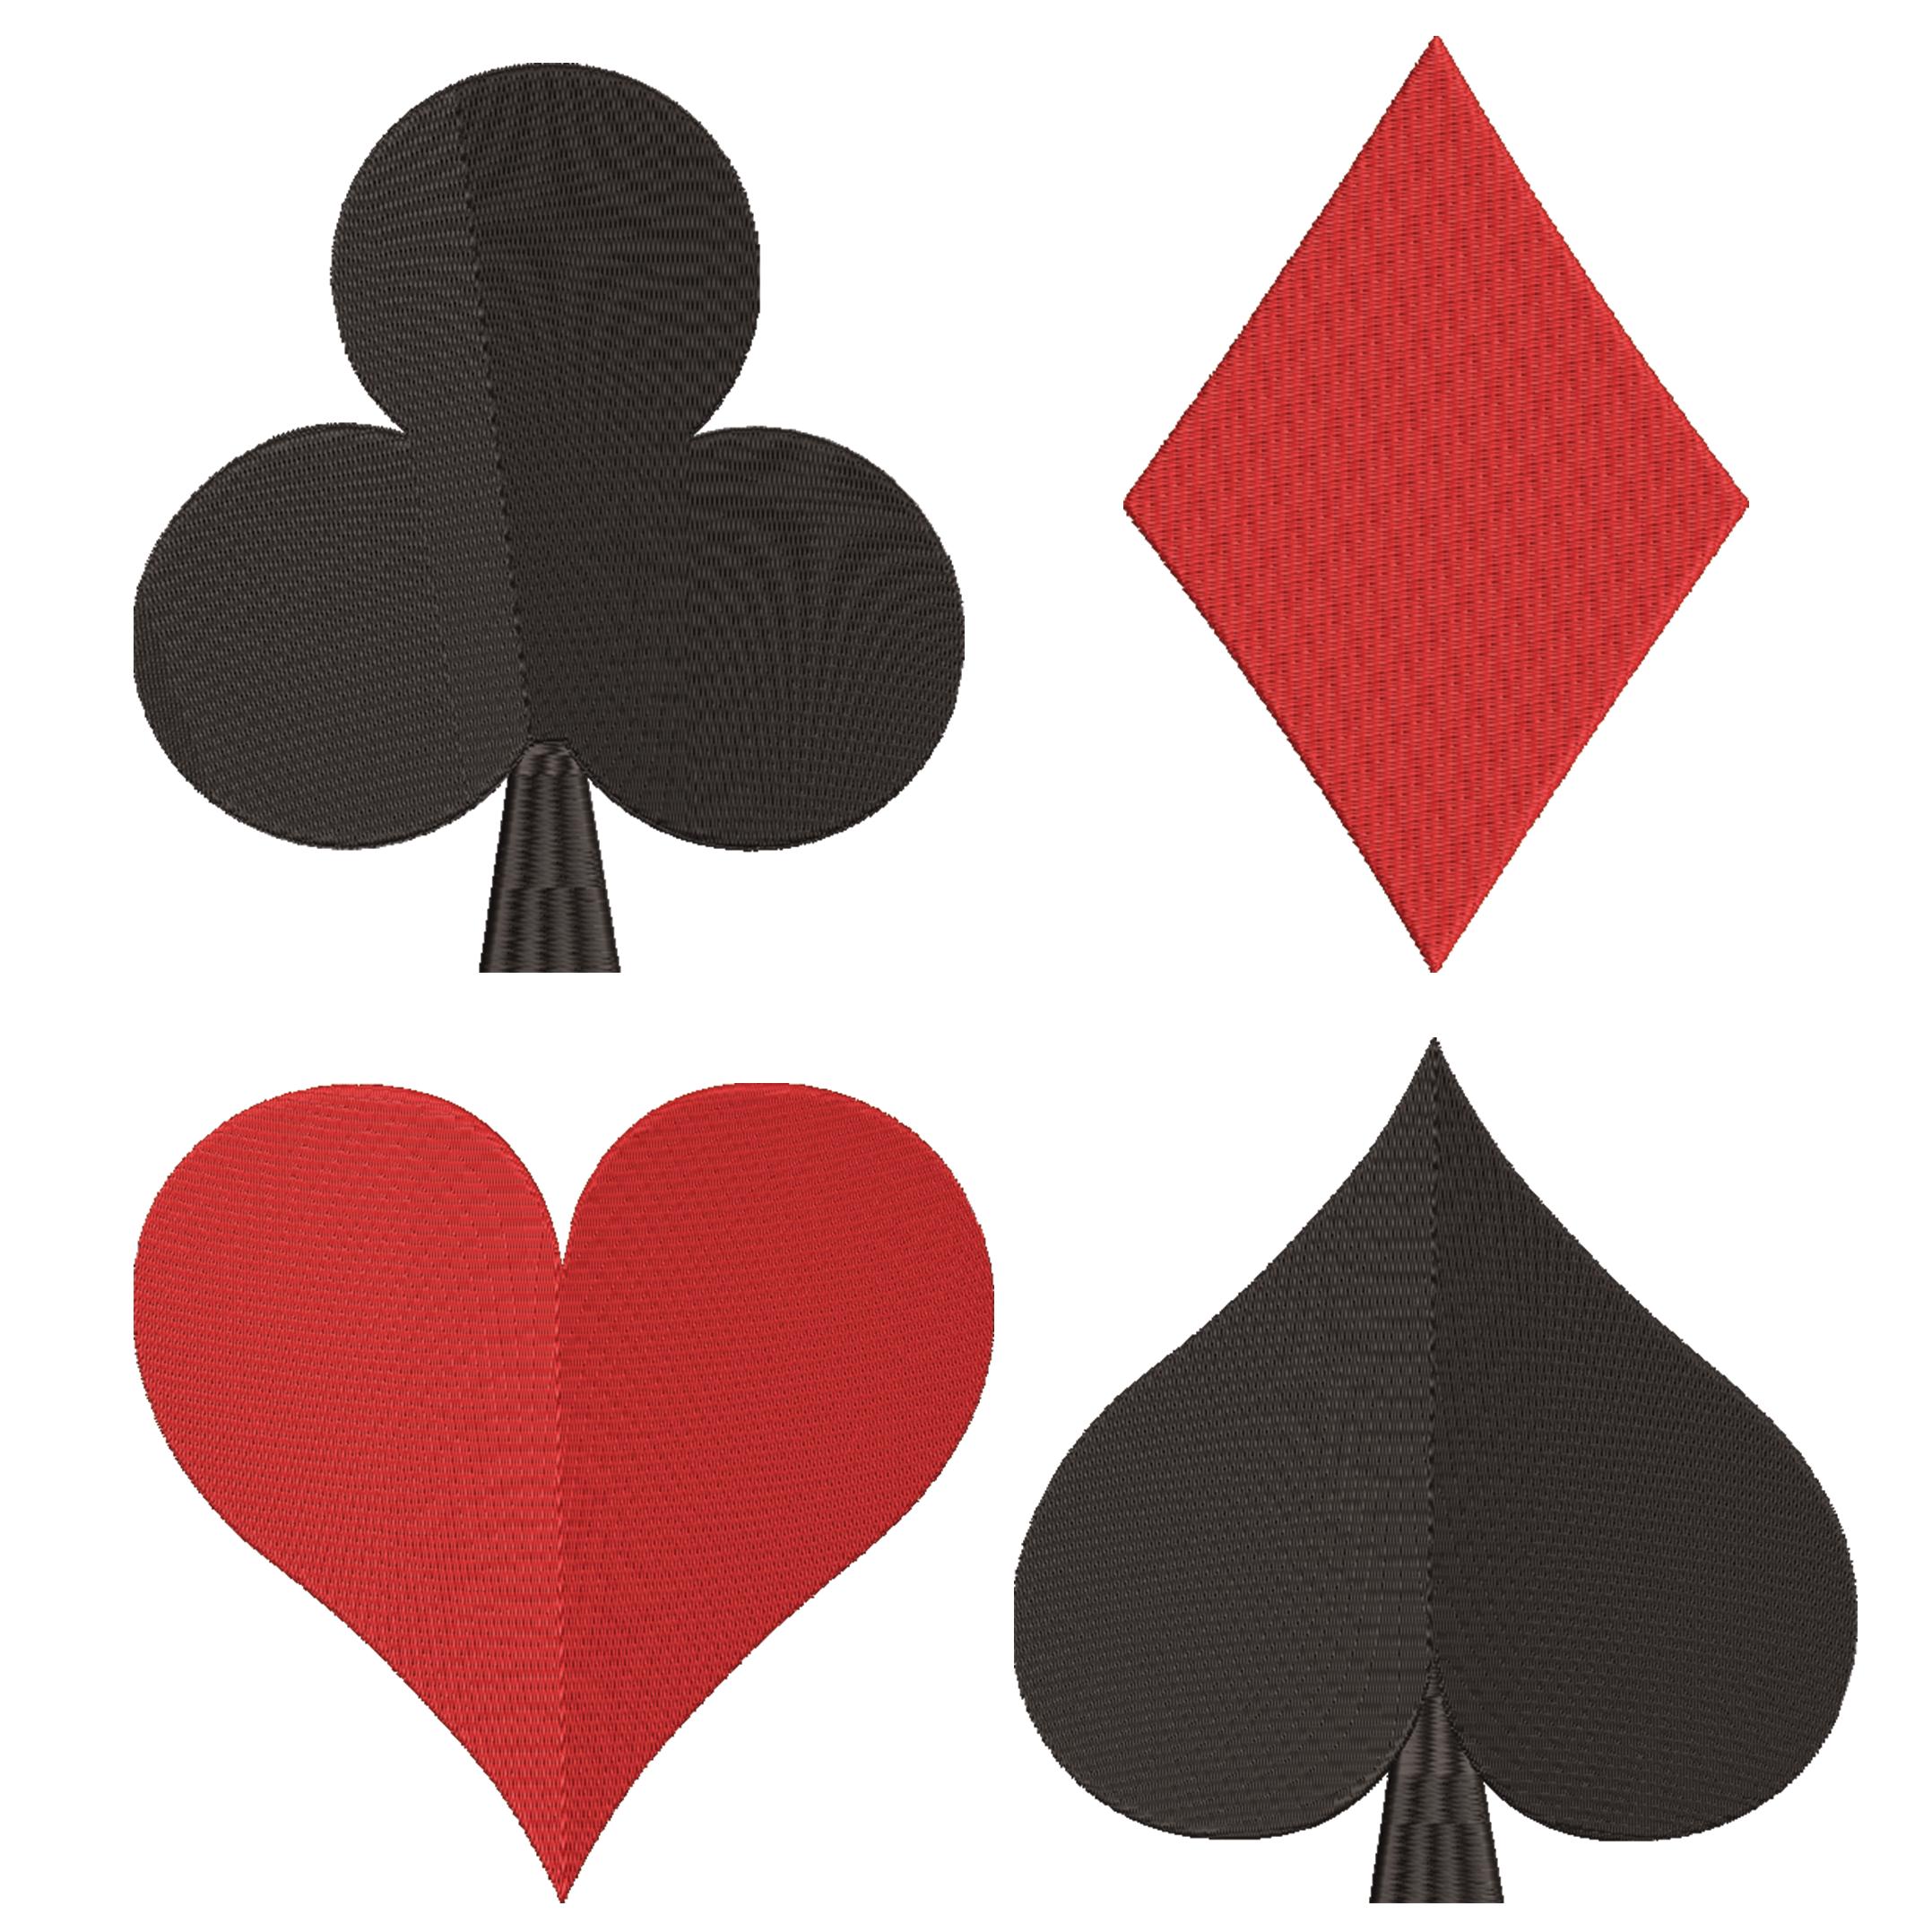 Card Suits Symbol Machine Embroidery Design Deck Of Card Symbol Poker Cards Embroidery Game Card Symbol Spade Heart Club Diamond Card Machine Embroidery Designs Embroidery Designs Machine Embroidery